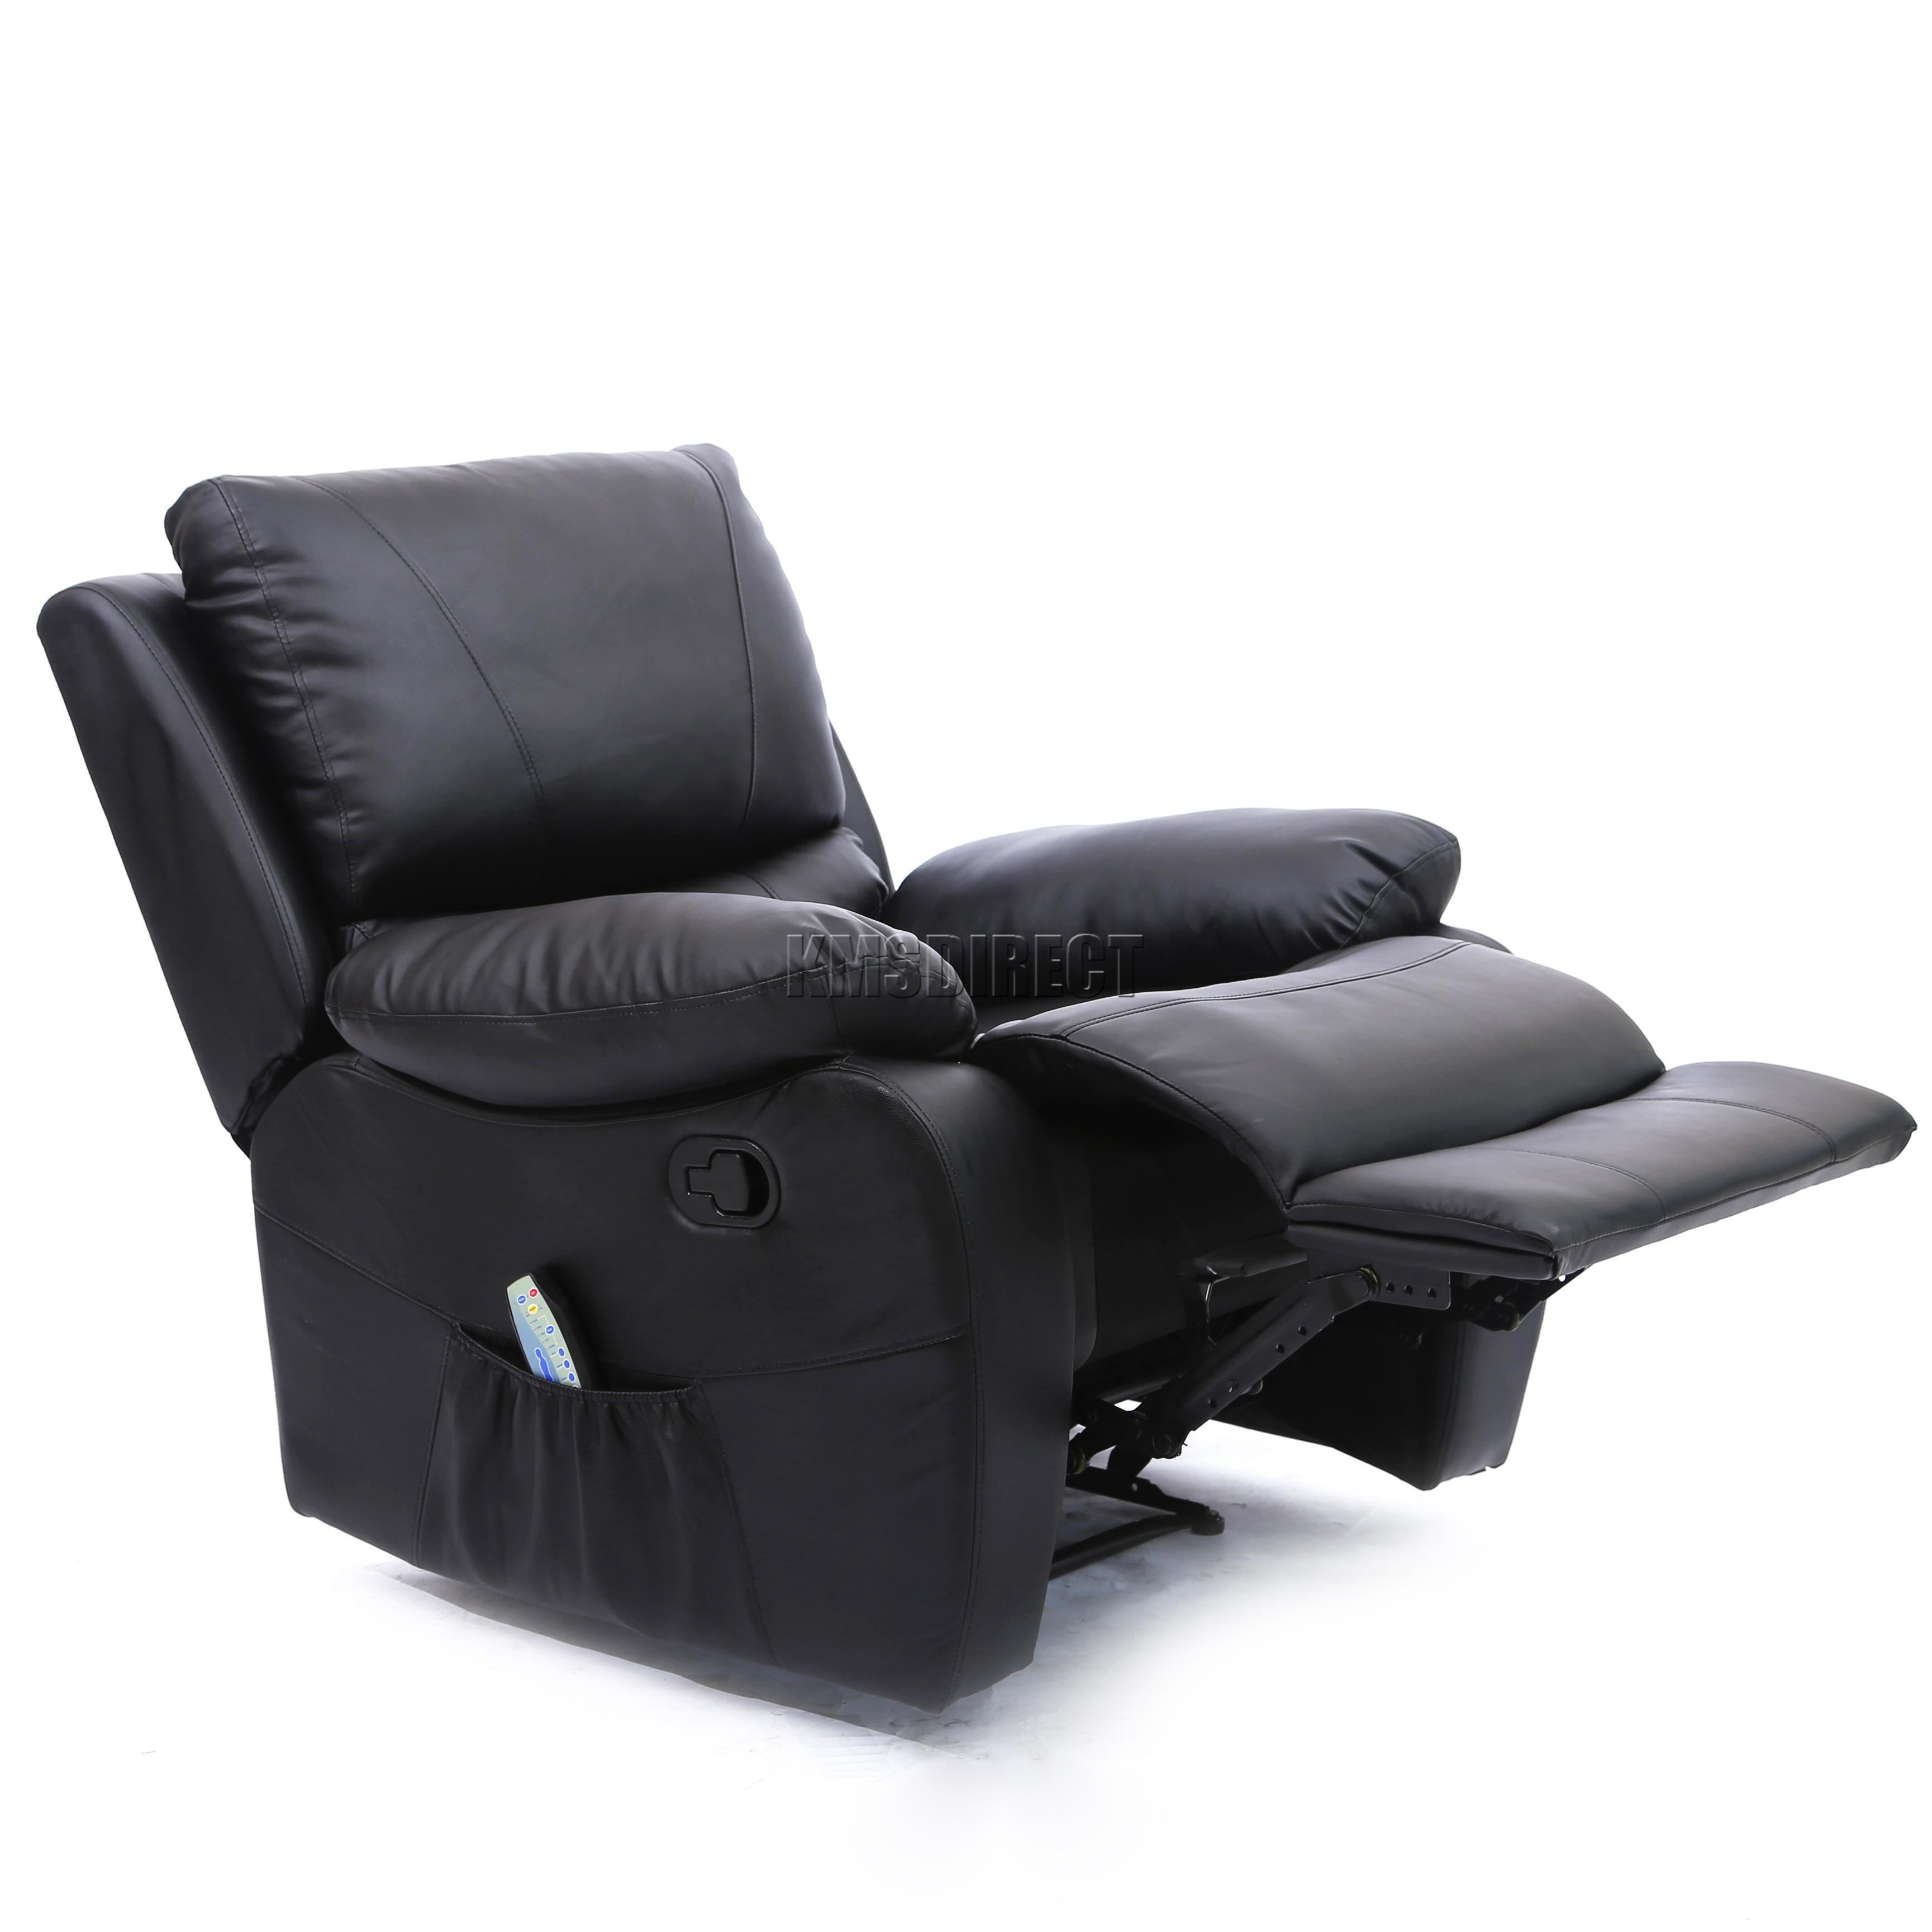 FoxHunter Leather Massage Cinema Recliner Sofa Chair Armchair Heat